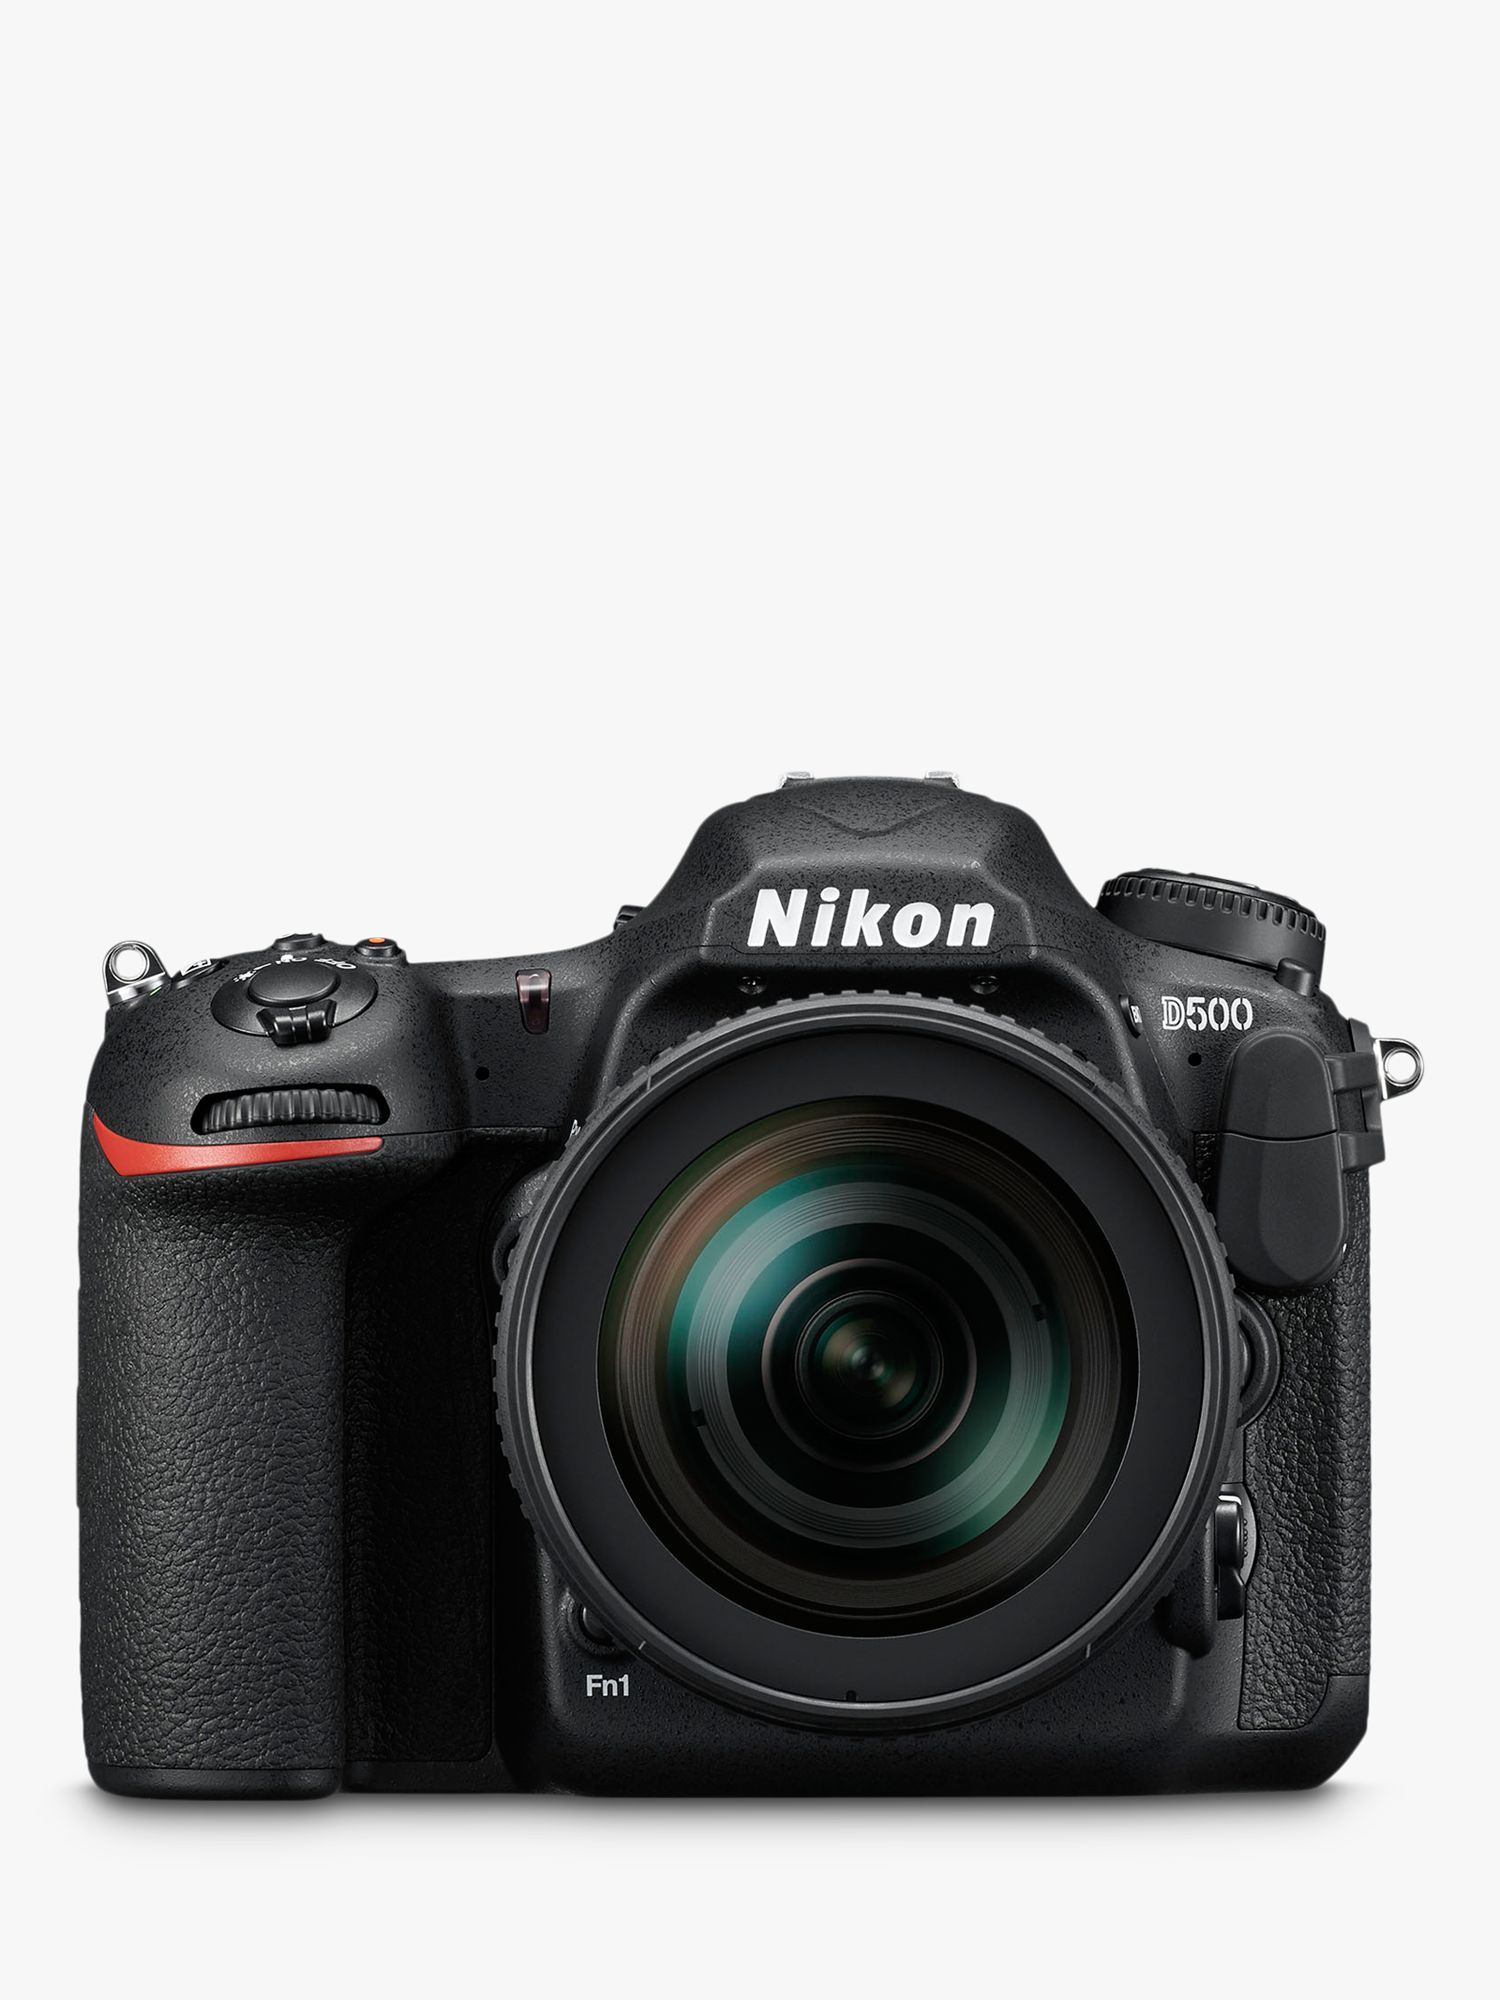 Nikon Nikon DX D500 Digital SLR Camera With 16-80mm VR Lens, 4K Ultra HD, 20.9MP, Wi-Fi/Bluetooth/NFC, 3.2 Tiltable Touch Screen, Black